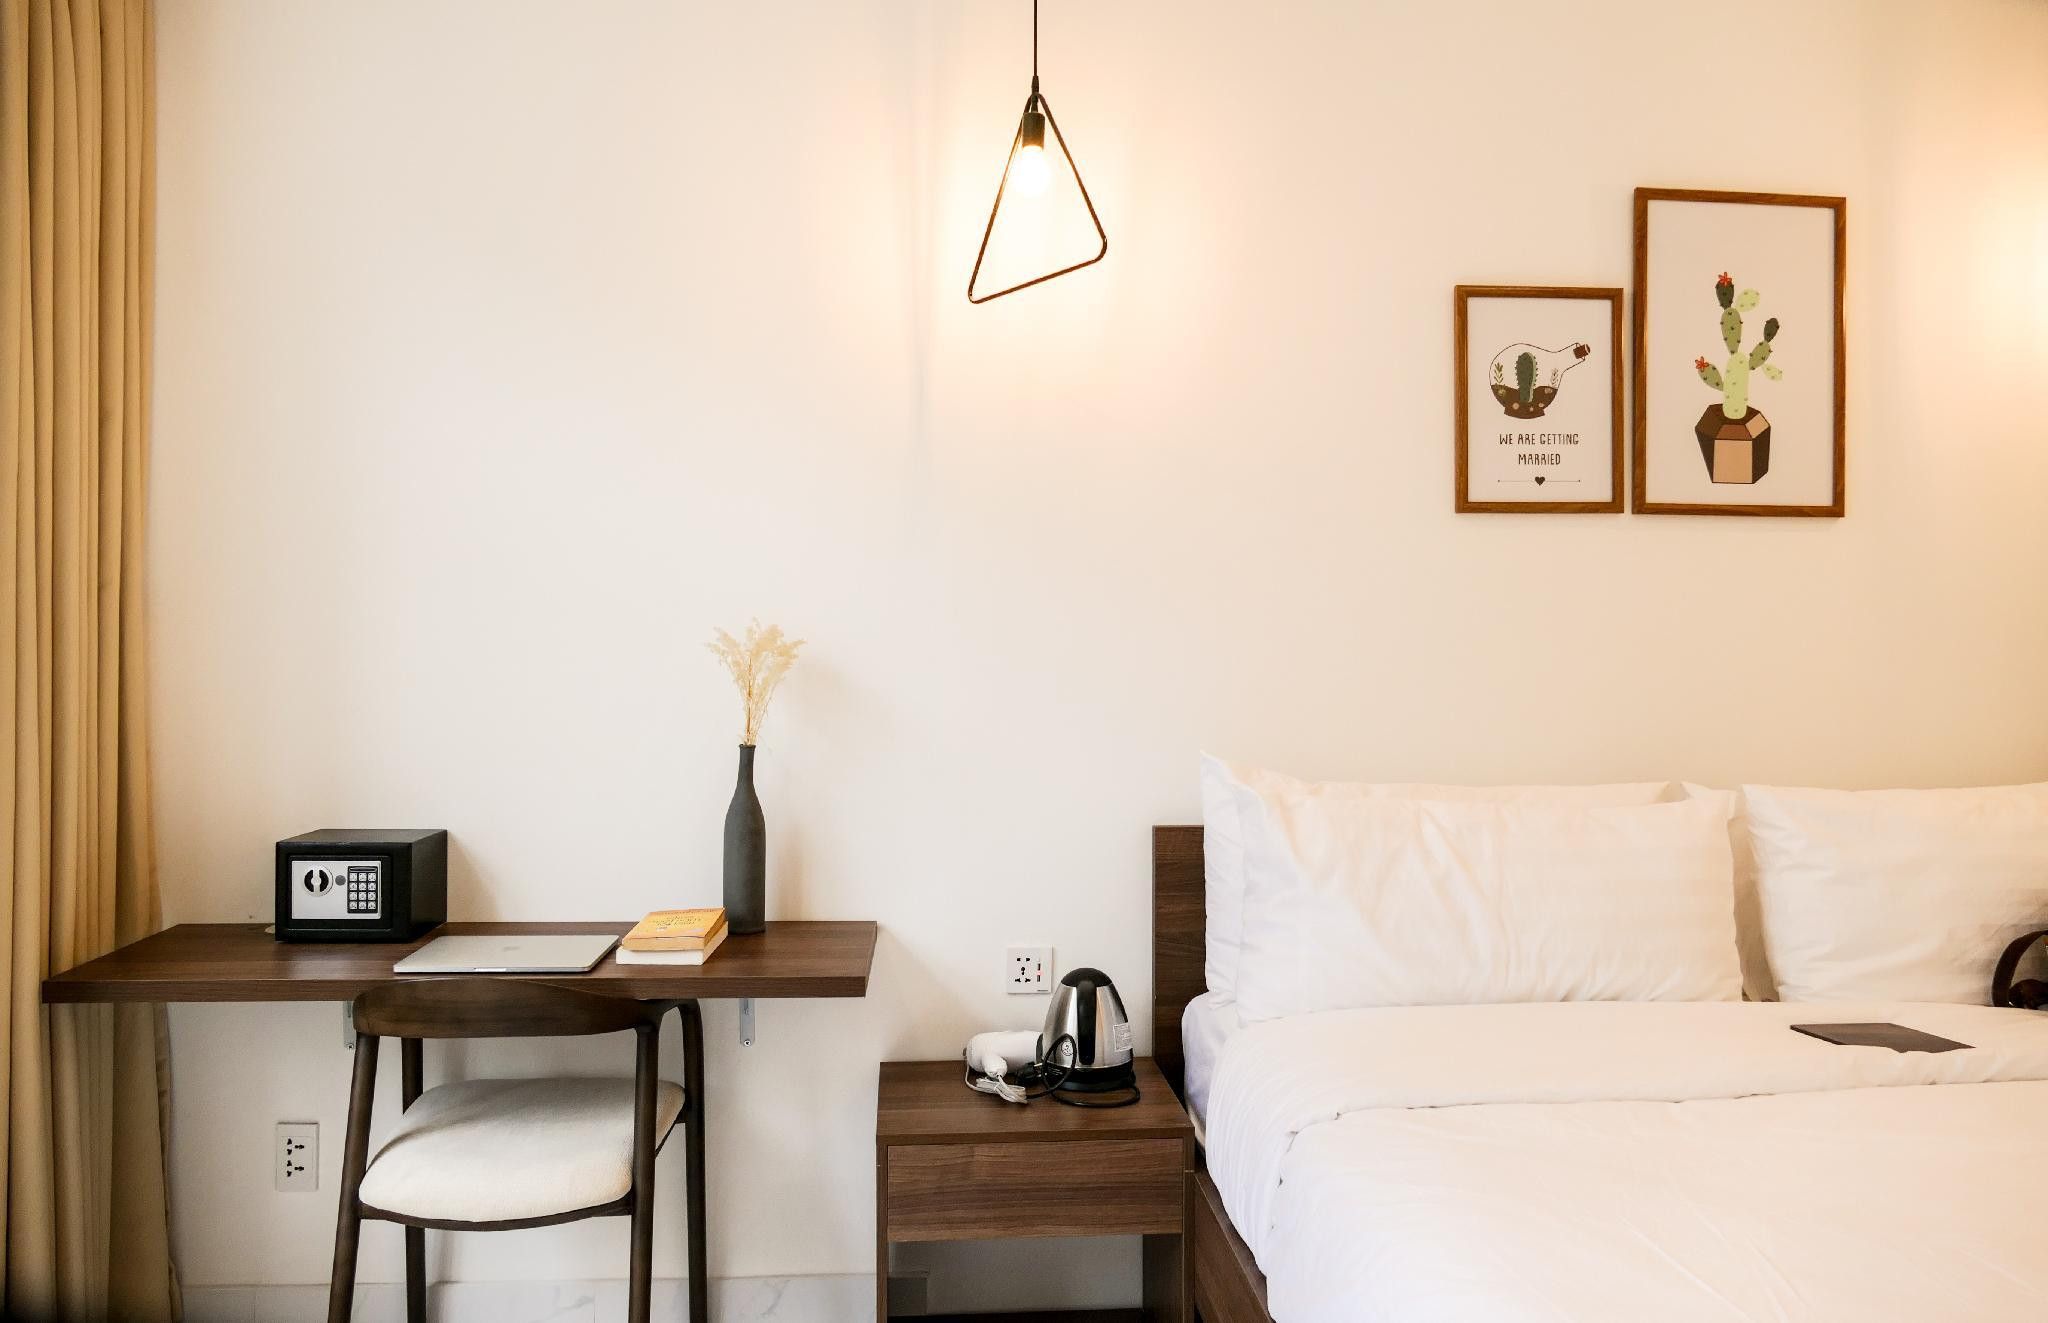 Hyen Hotel & Spa Ben Thanh